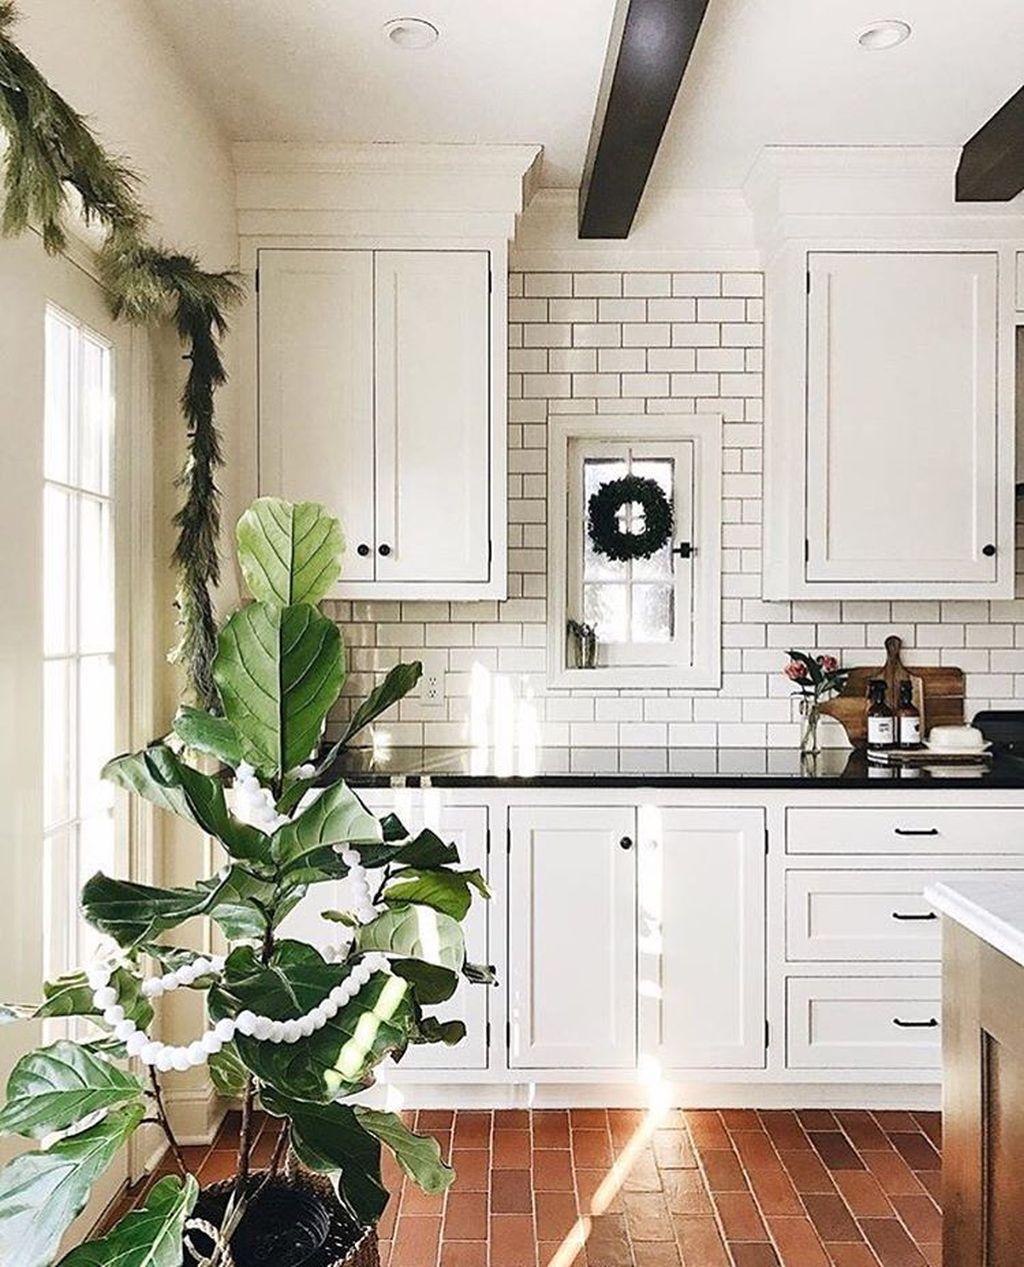 25 brick floor kitchen ideas in 2020 brick floor